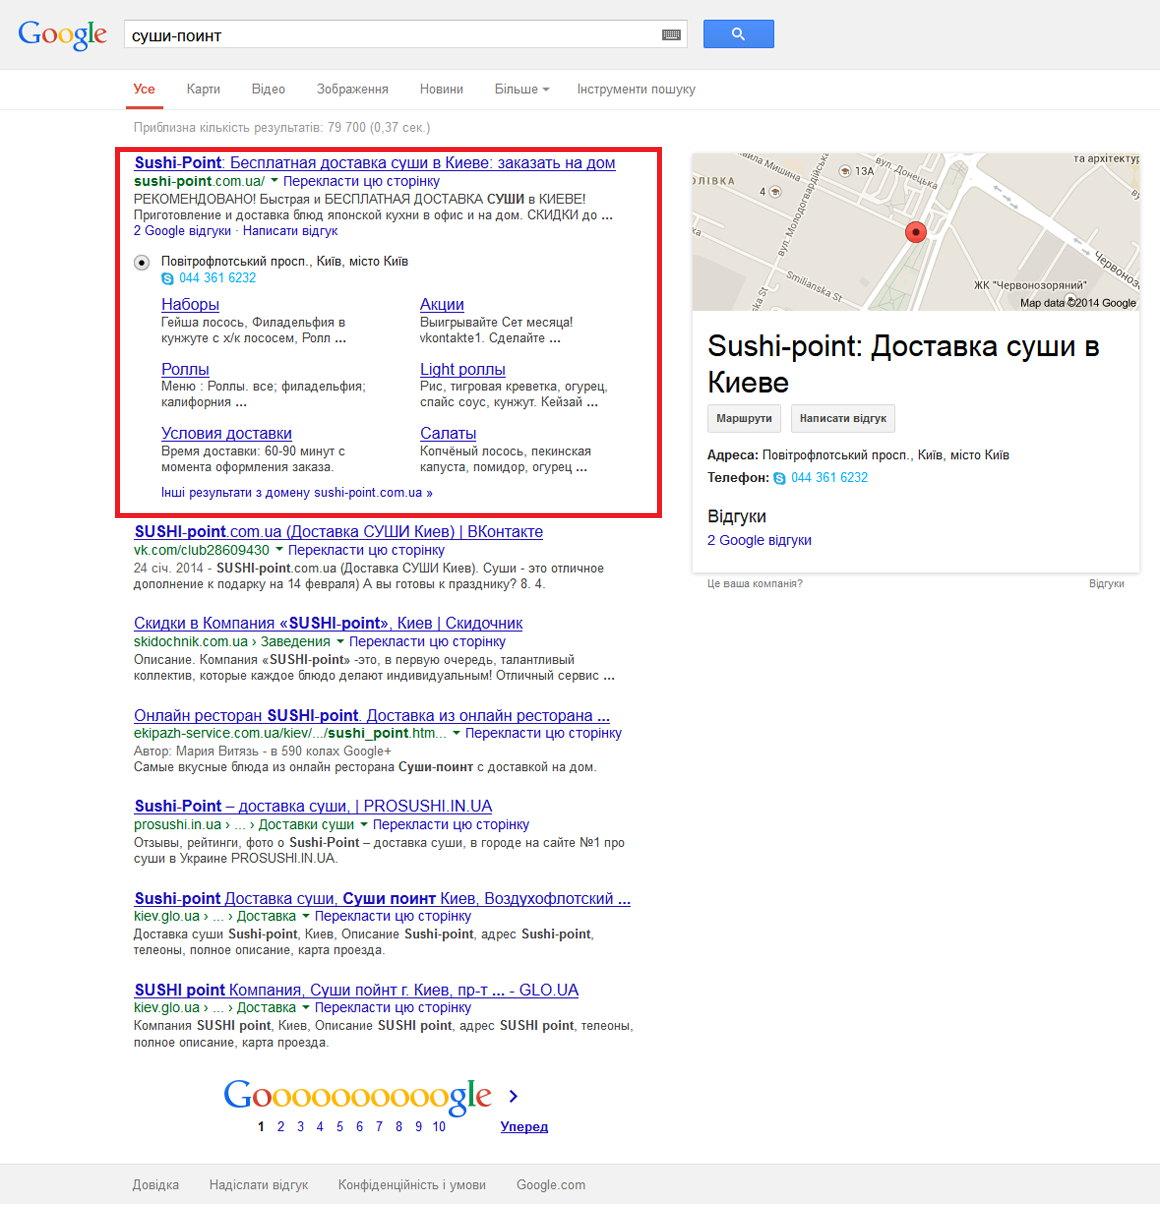 FireShot-Screen-Capture-145-sushi-point-Poshuk-Google-www_google_com_ua_search_noj1q-spell1saXei1RoCU9mGF4zAtAa3g4GACgved0CCcQvwUoAAbiw1366bih618